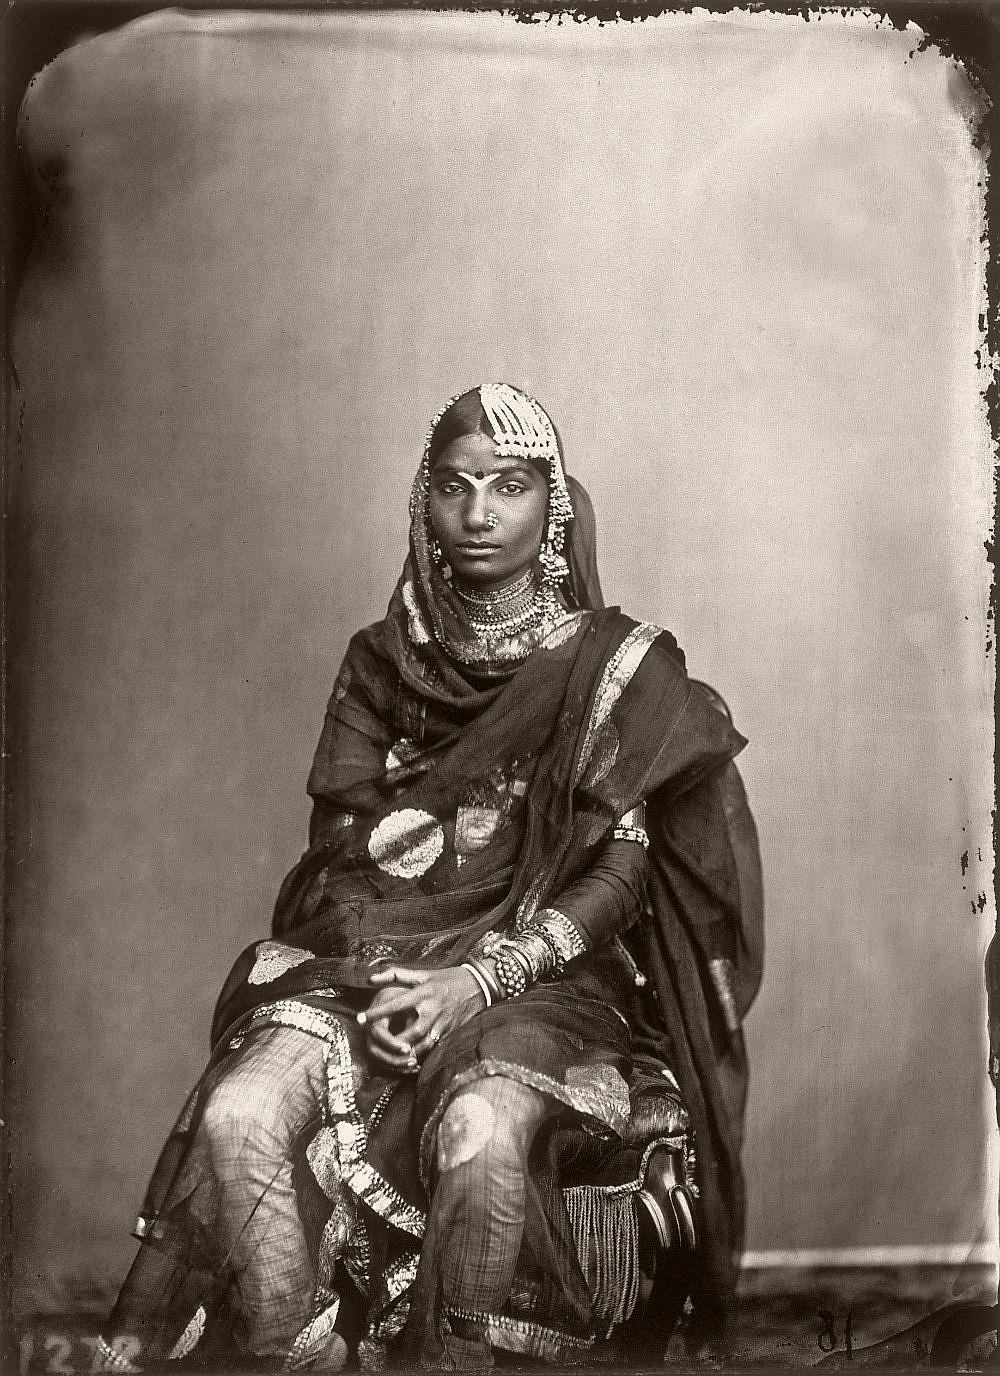 Imto the harem circa 1920 - 4 2